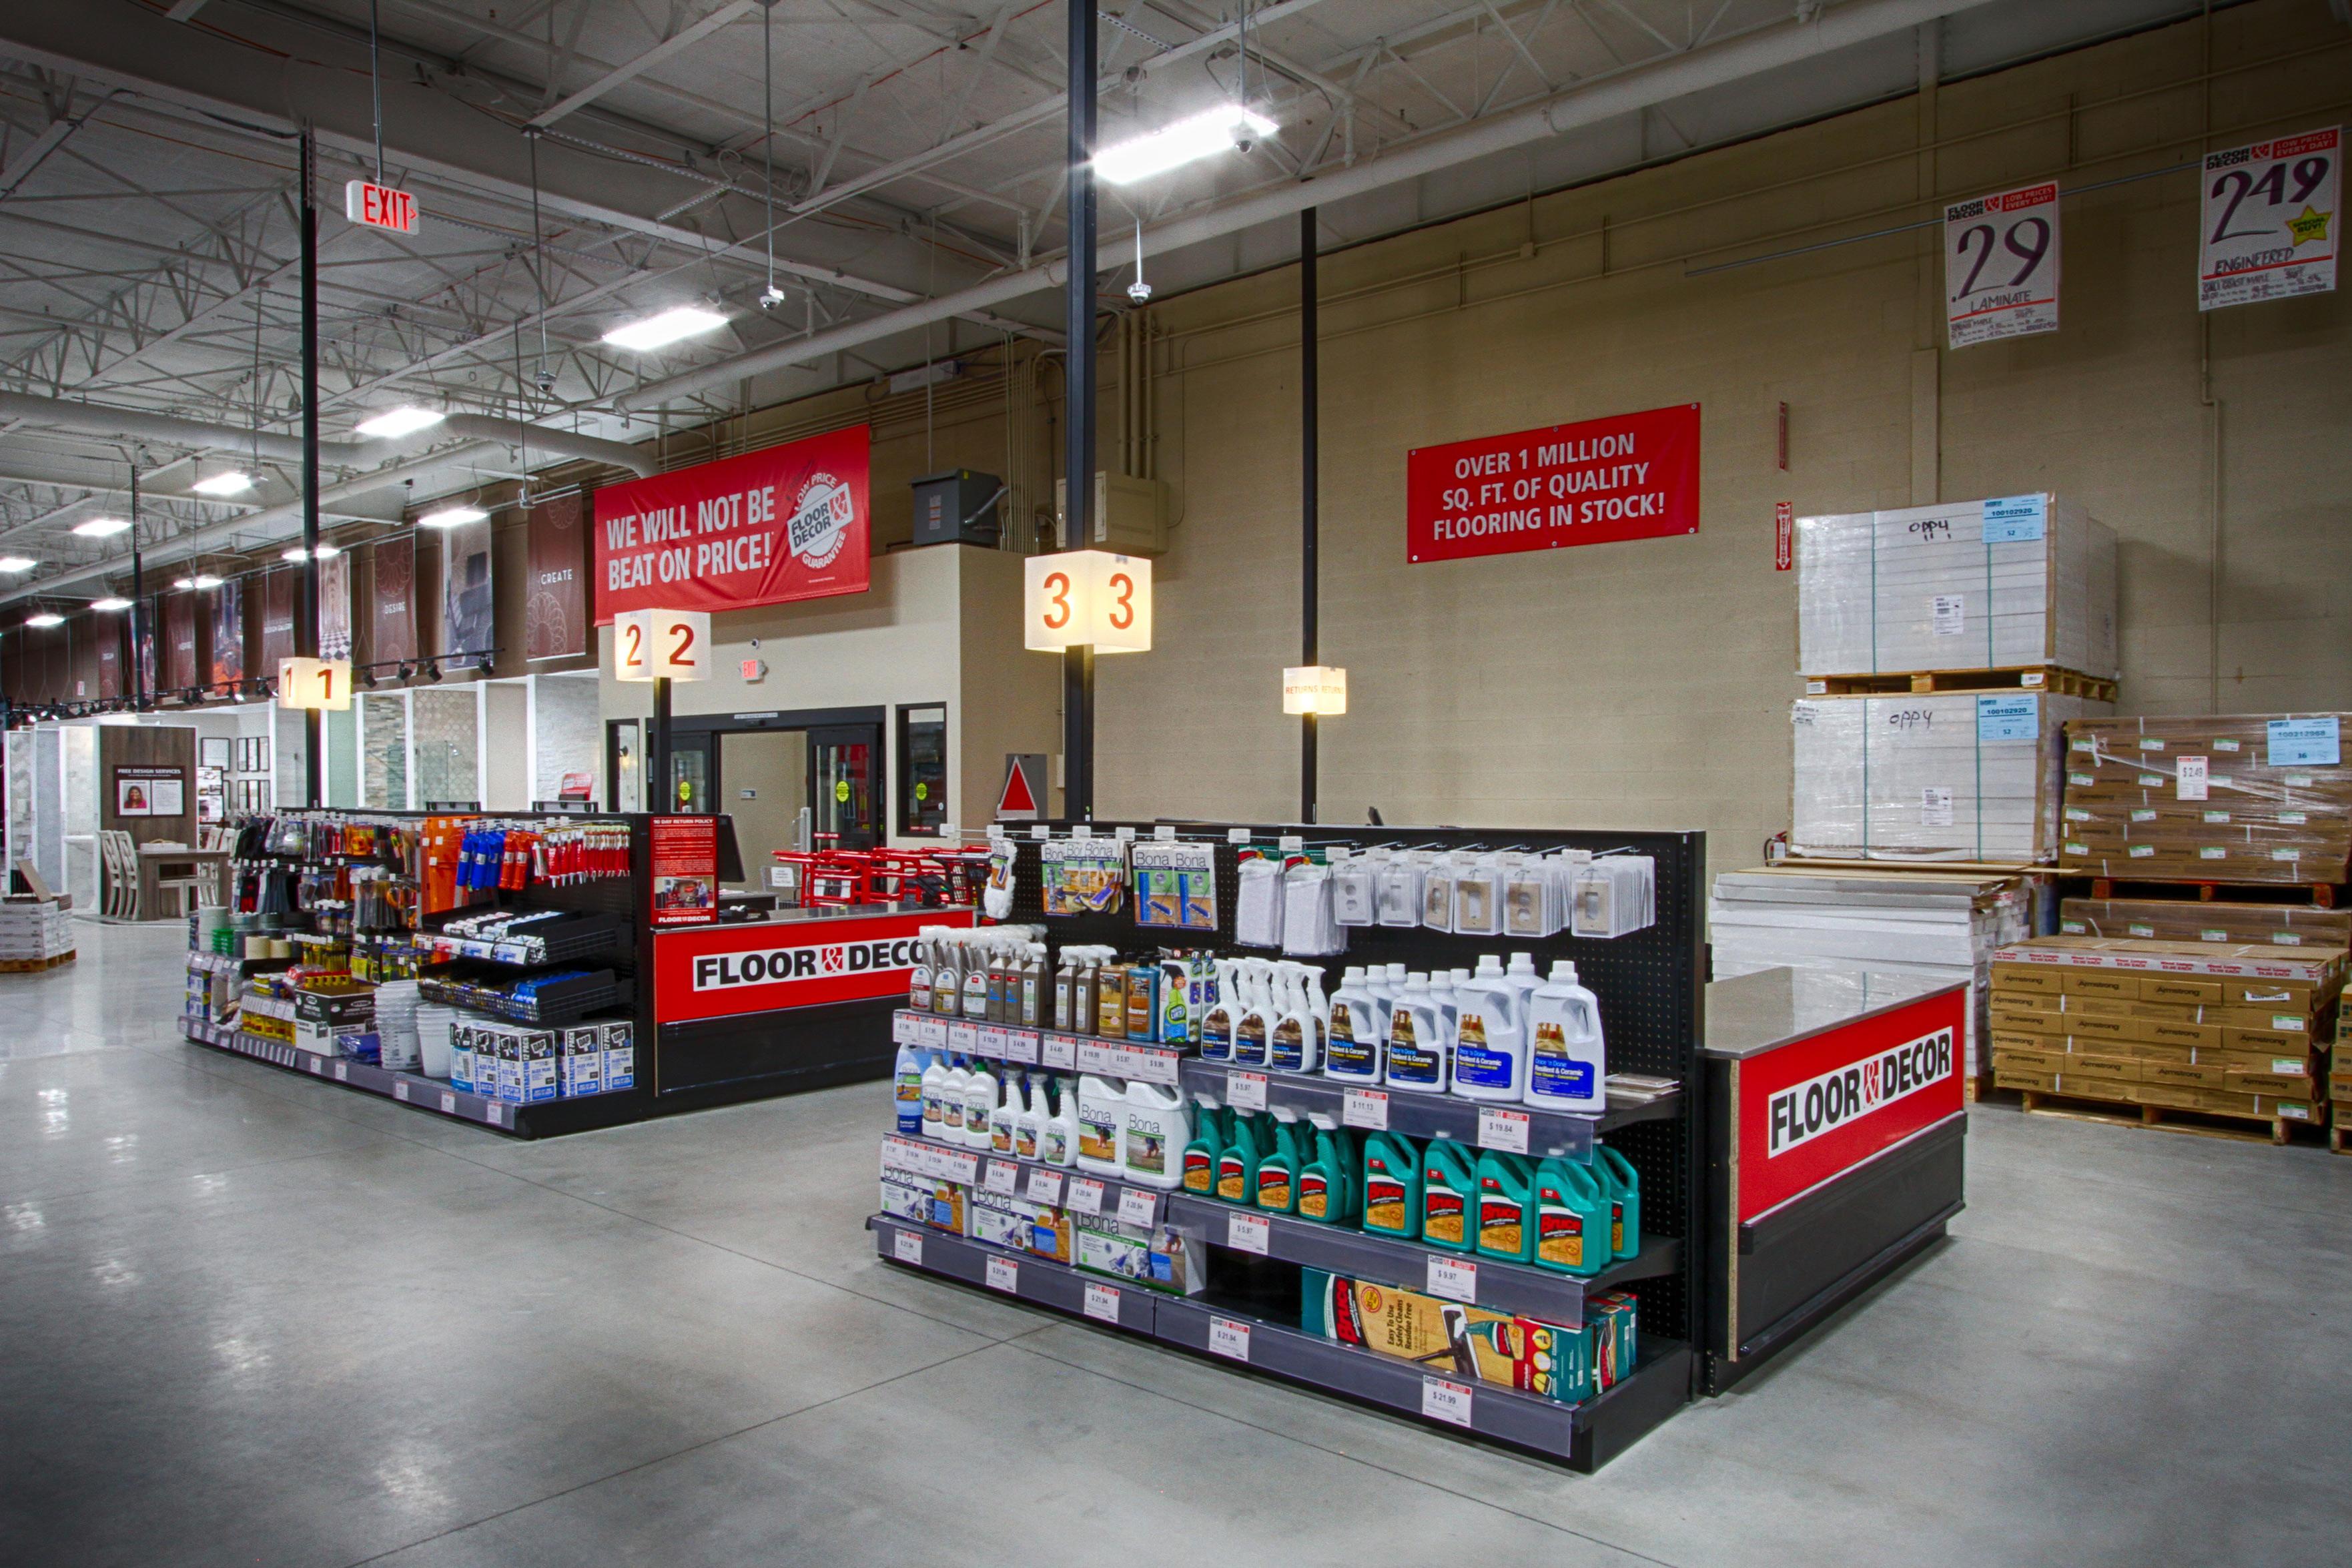 Floor Decor In Tampa Fl 813 207 1